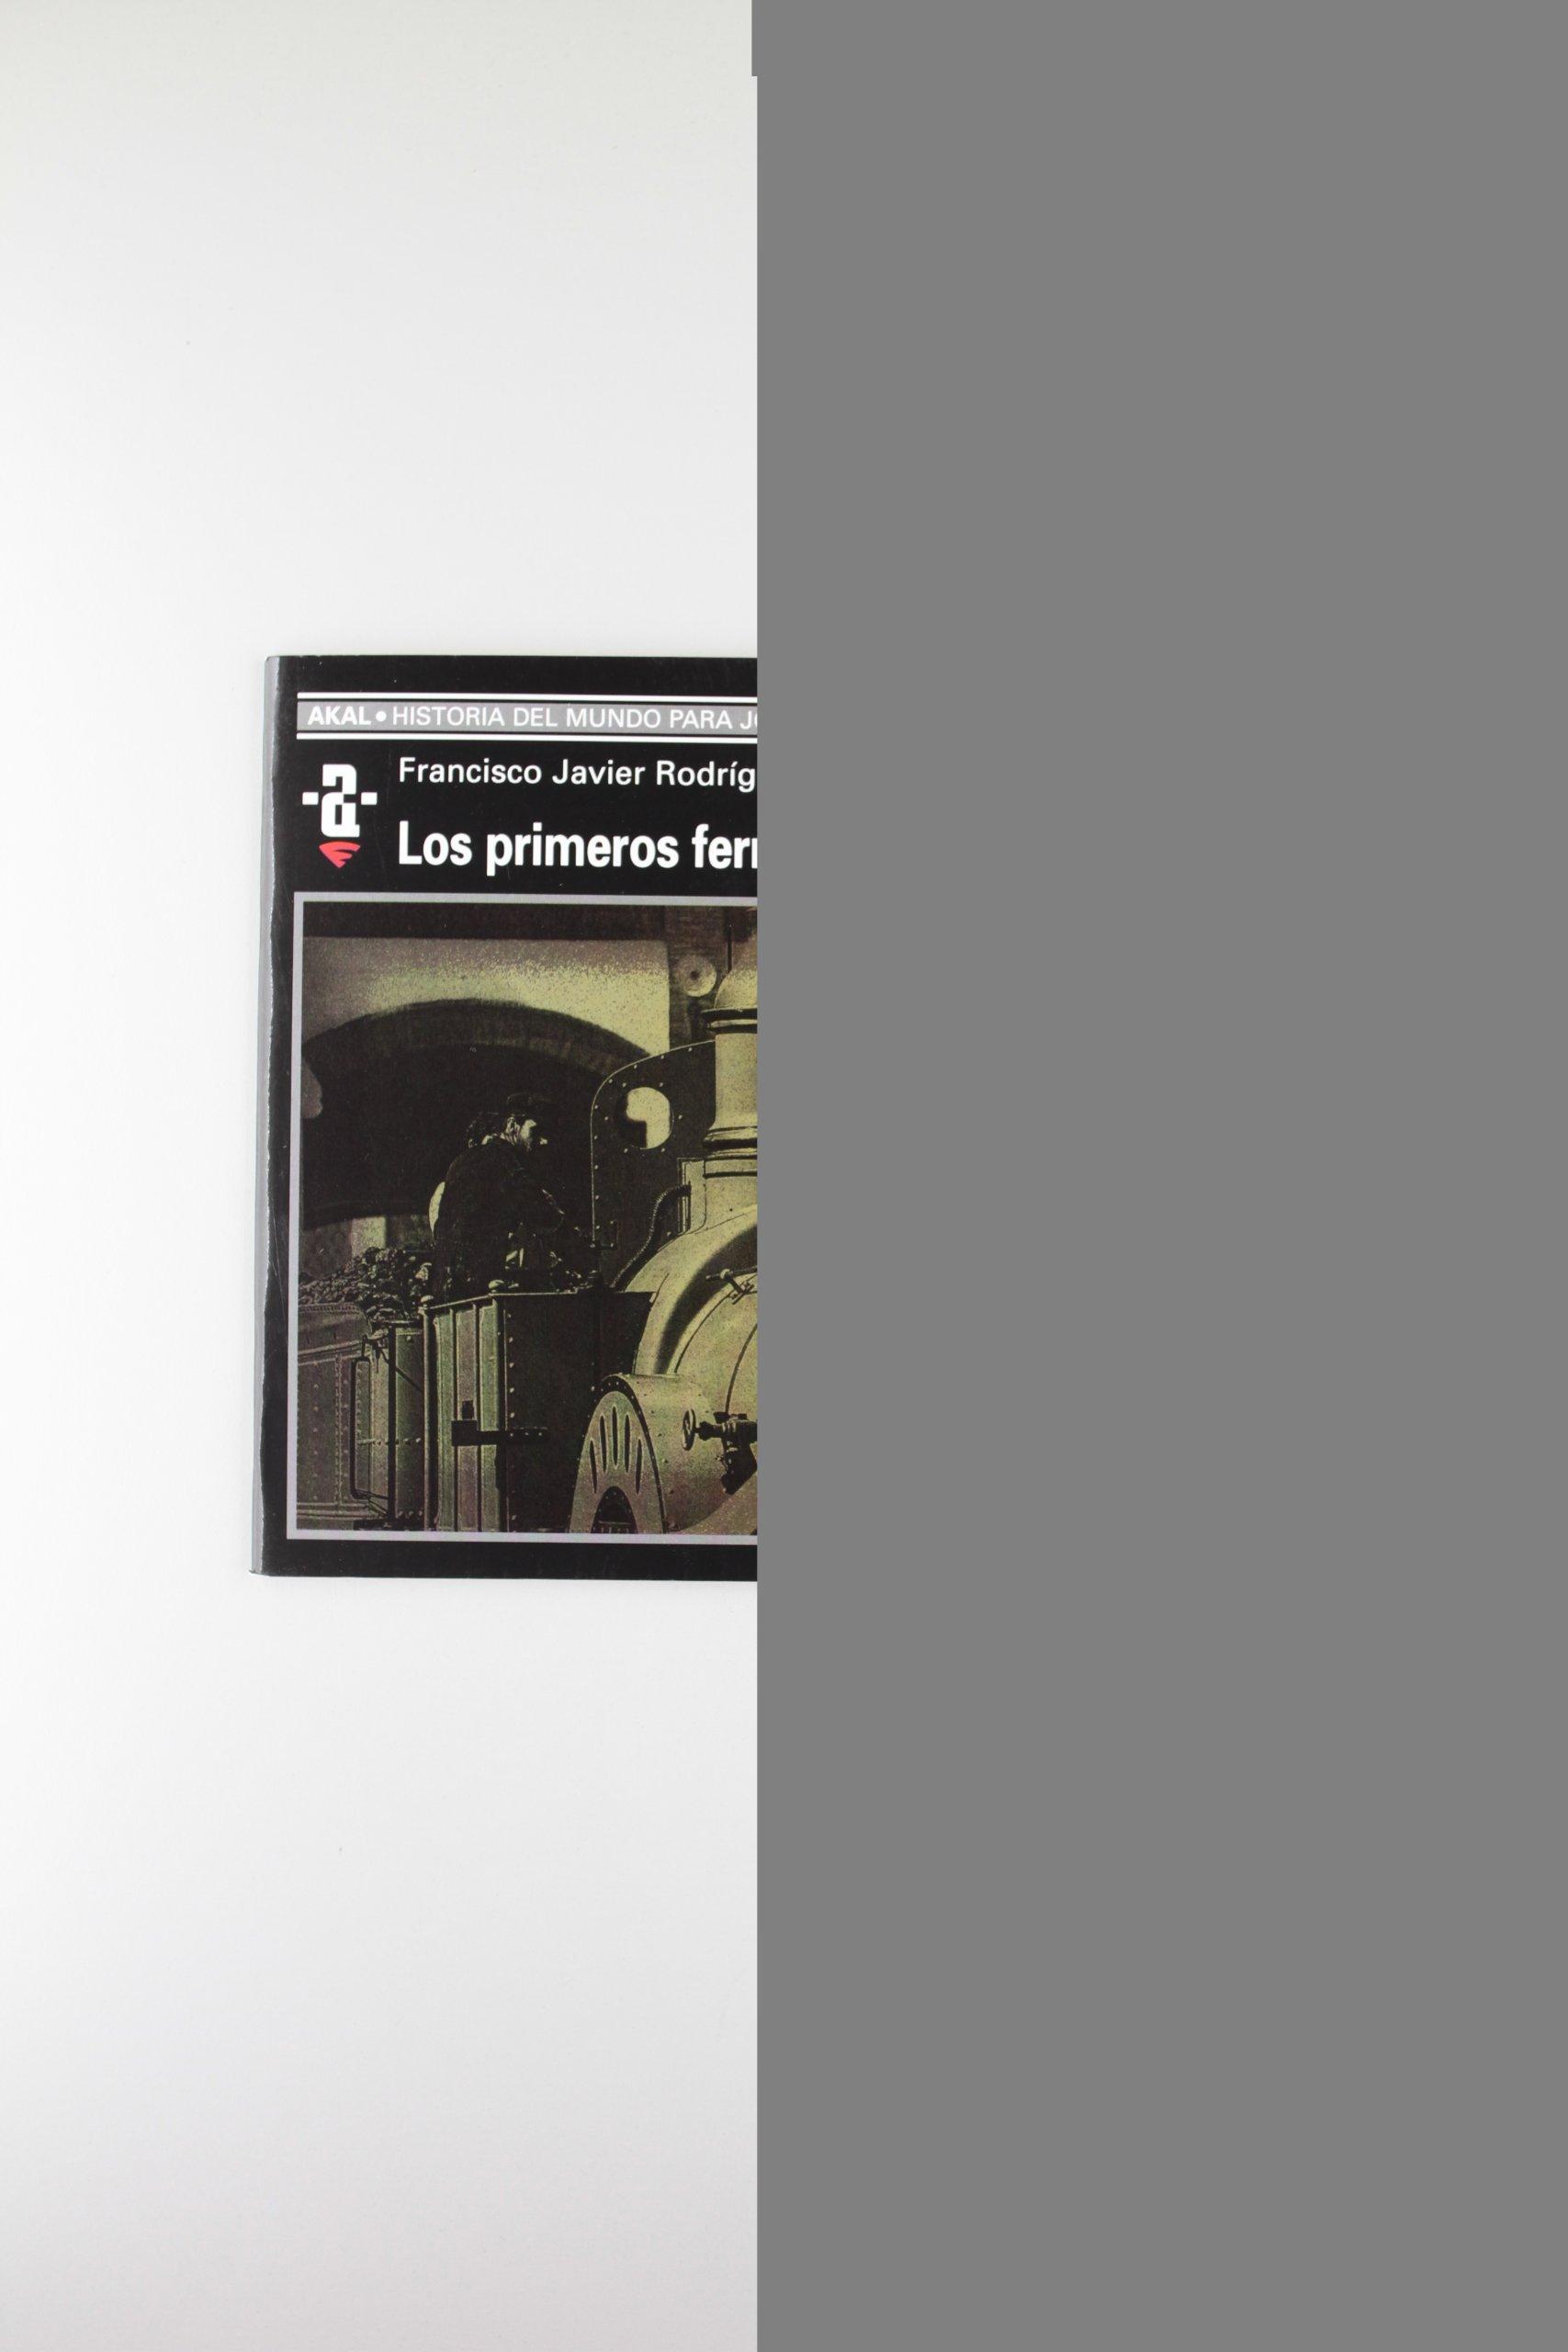 Los primeros ferrocarriles: FRANCISCO JAVIER RODRIGUEZ ...